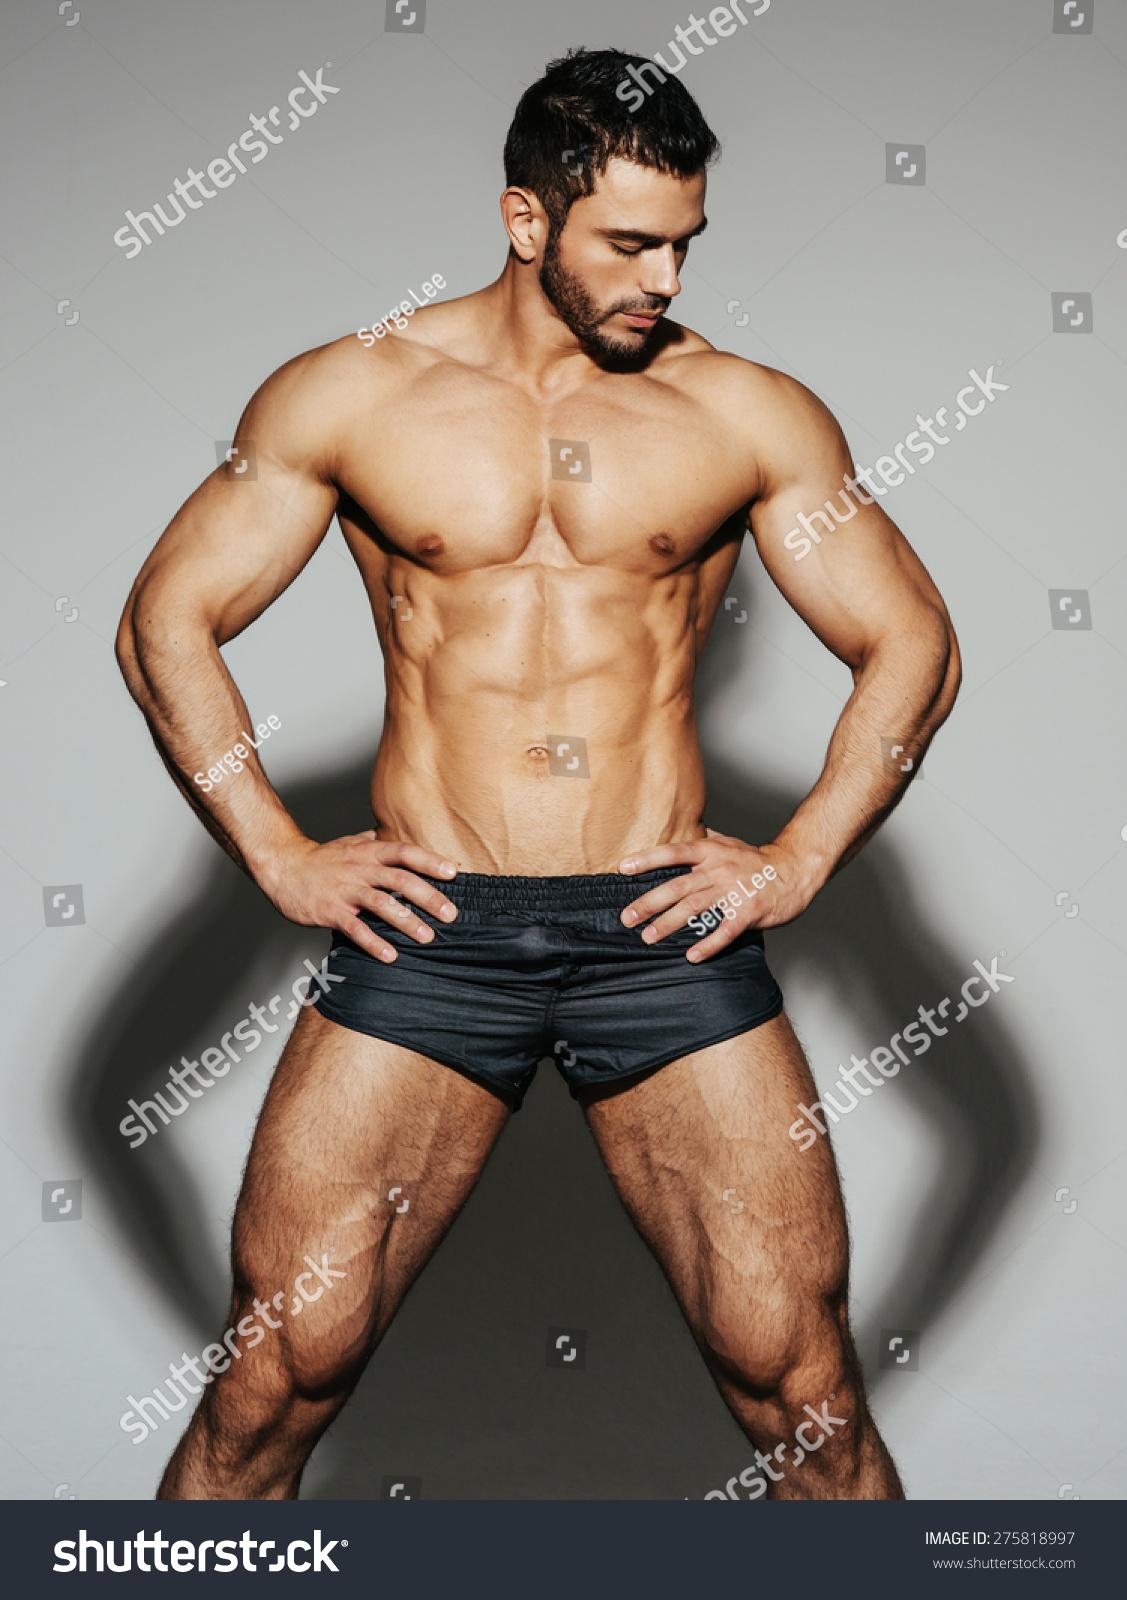 image Black men male model and long hair